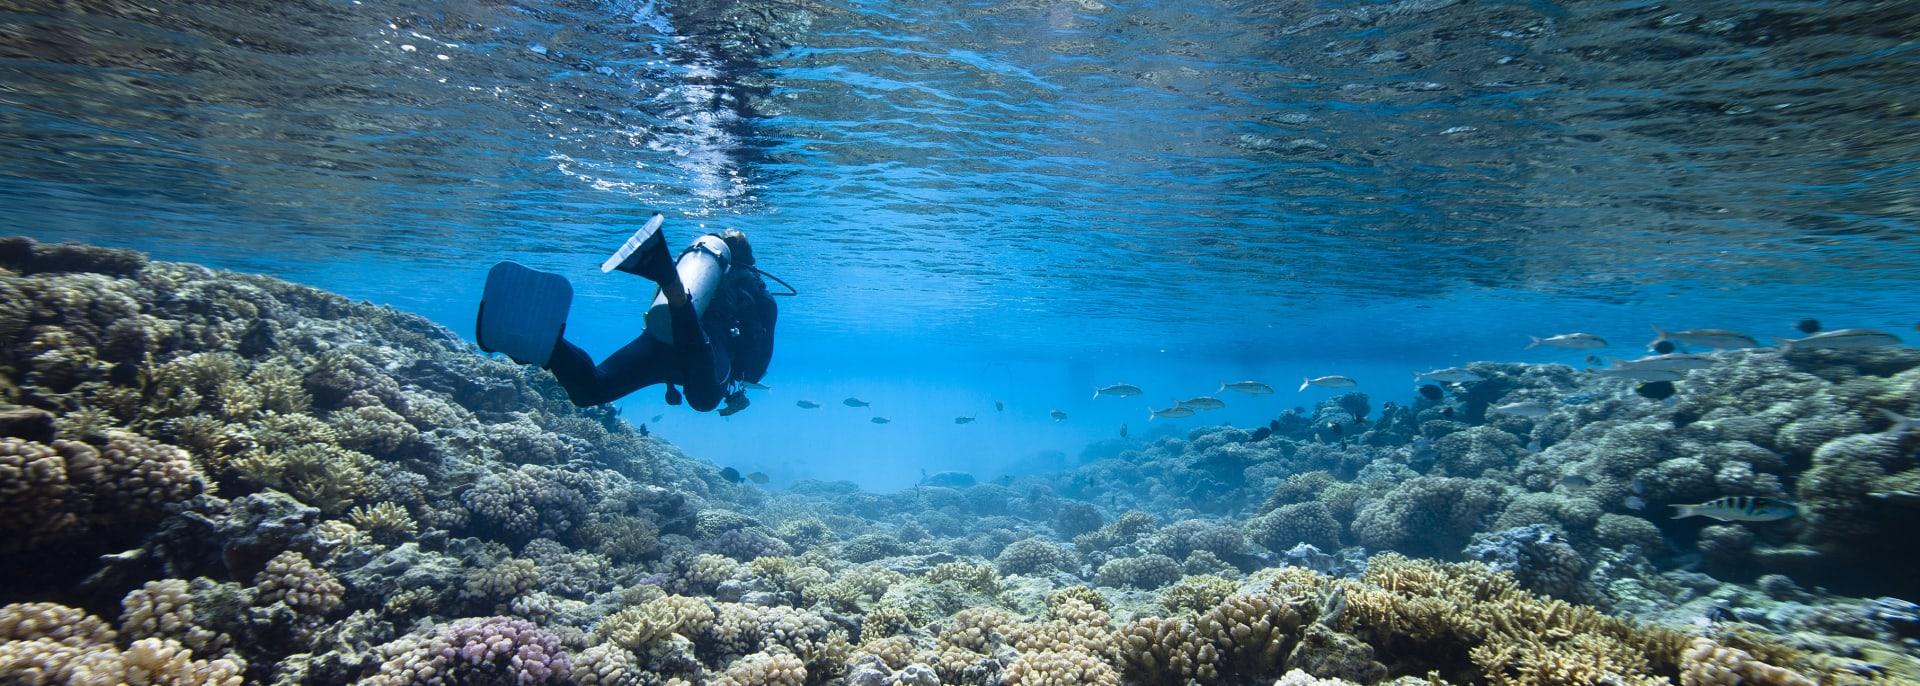 Tauchen, Neukaledonien